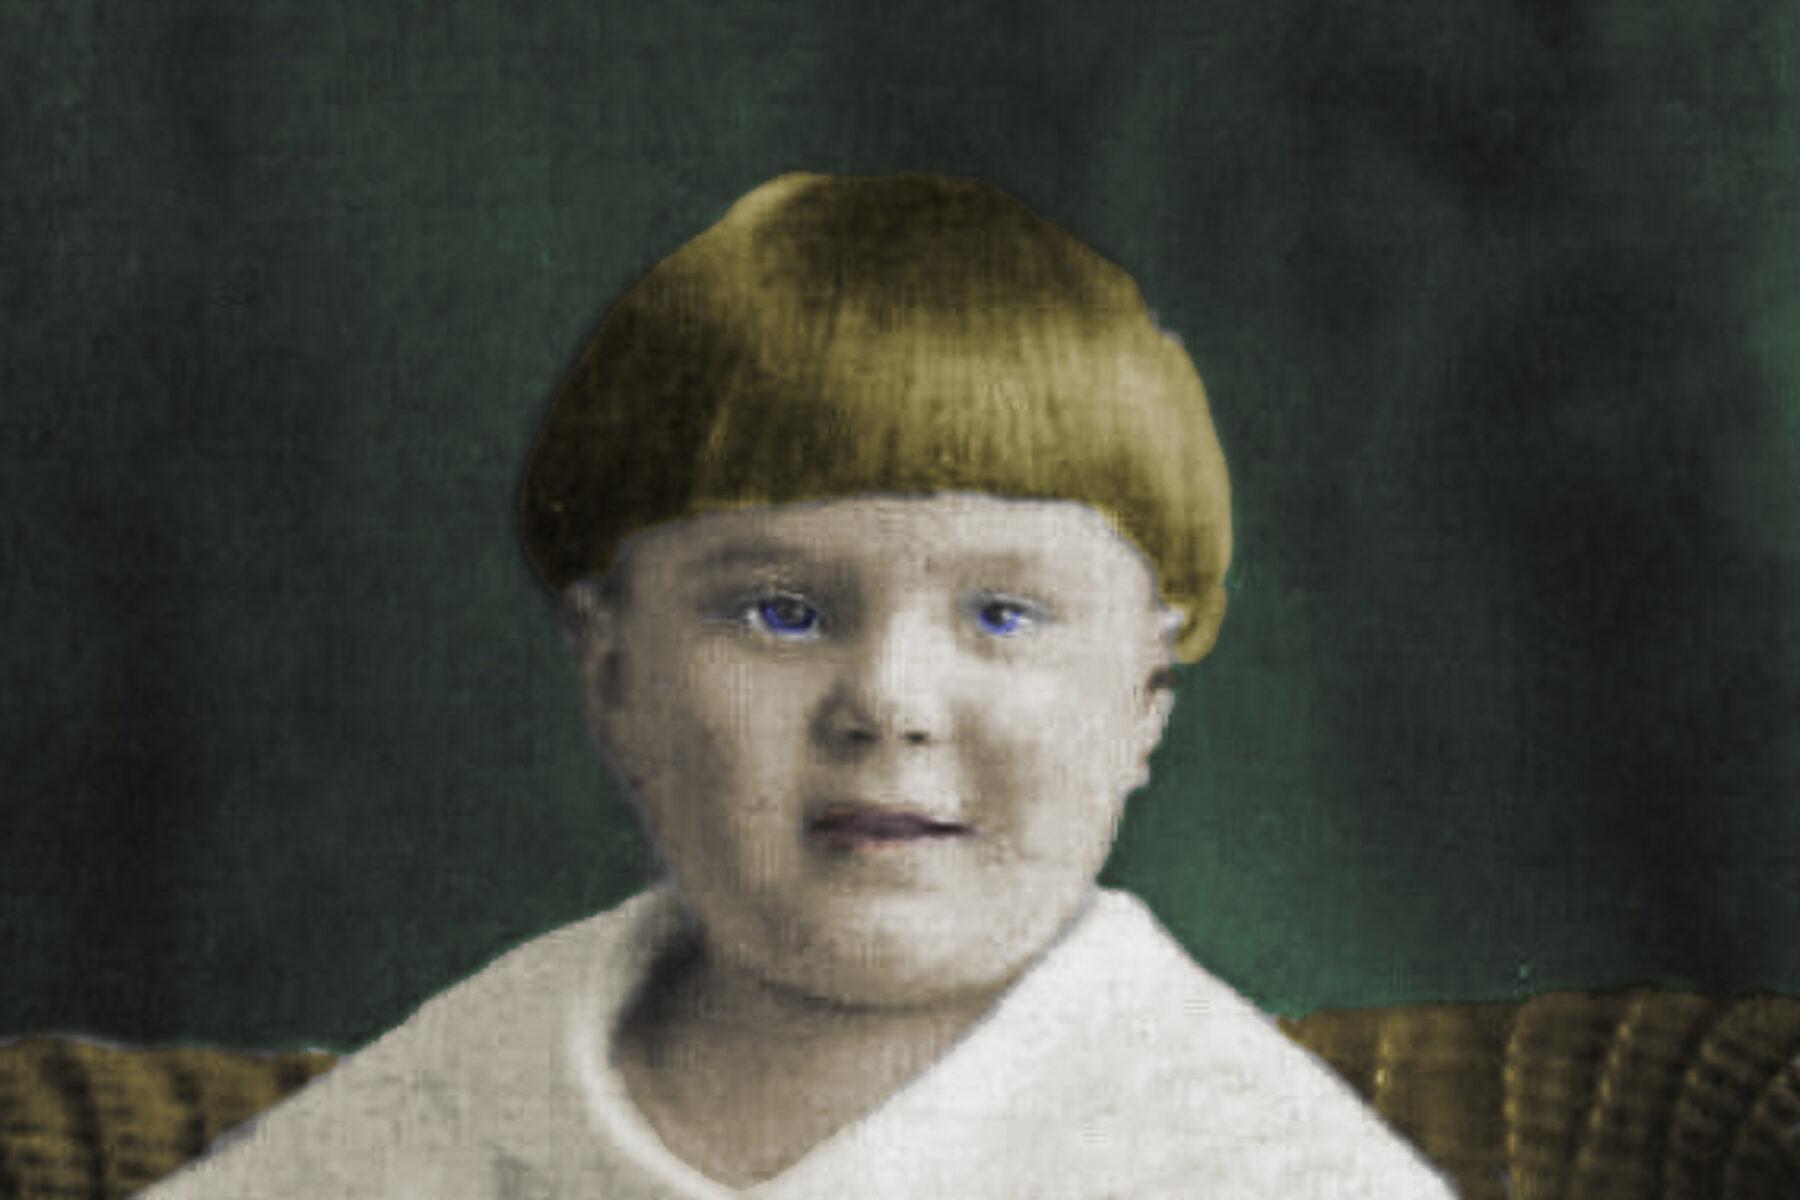 Tutoriel – Colorisation de photos anciennes